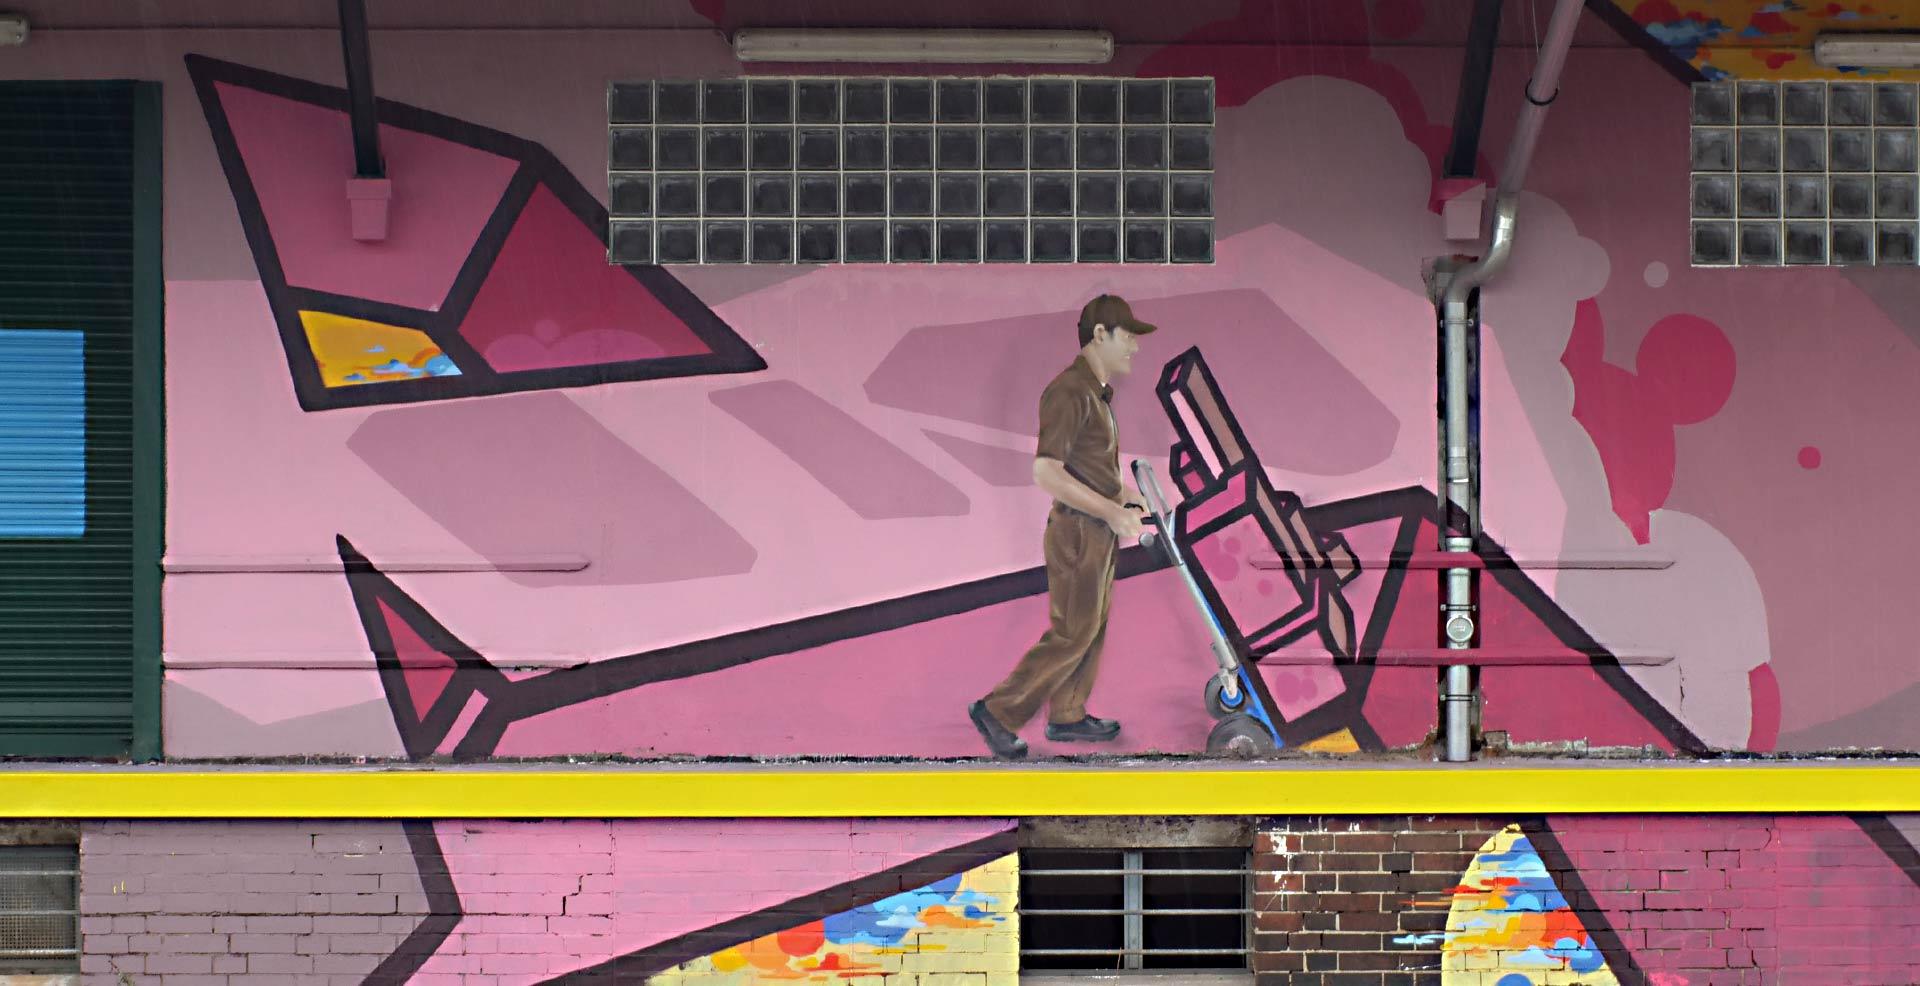 postman ups auslieferung Graffiti Spray